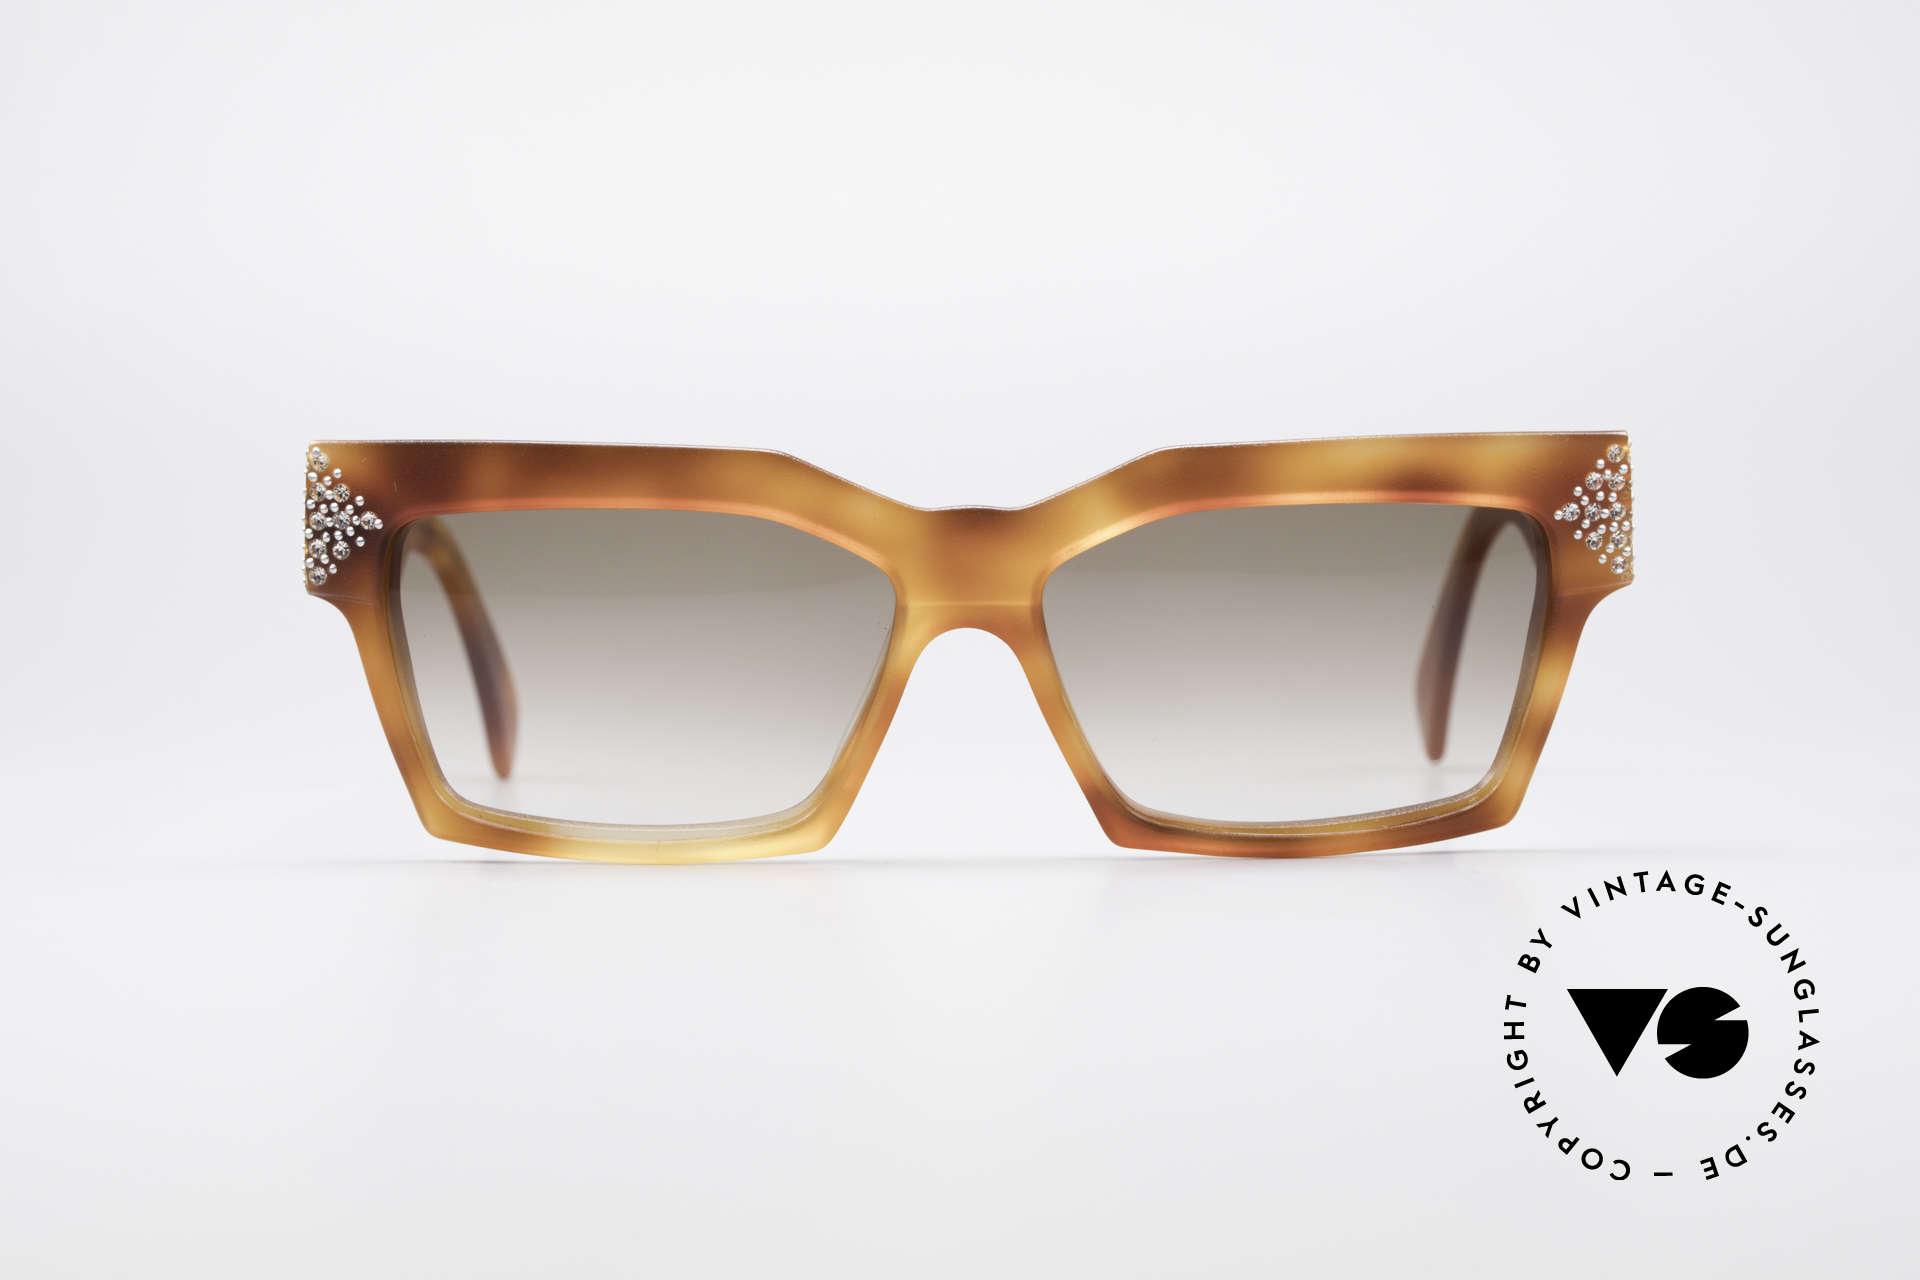 Alain Mikli 318 / 053 80's Gem Designer Sunglasses, the model looks like the shades of famous movie stars, Made for Women